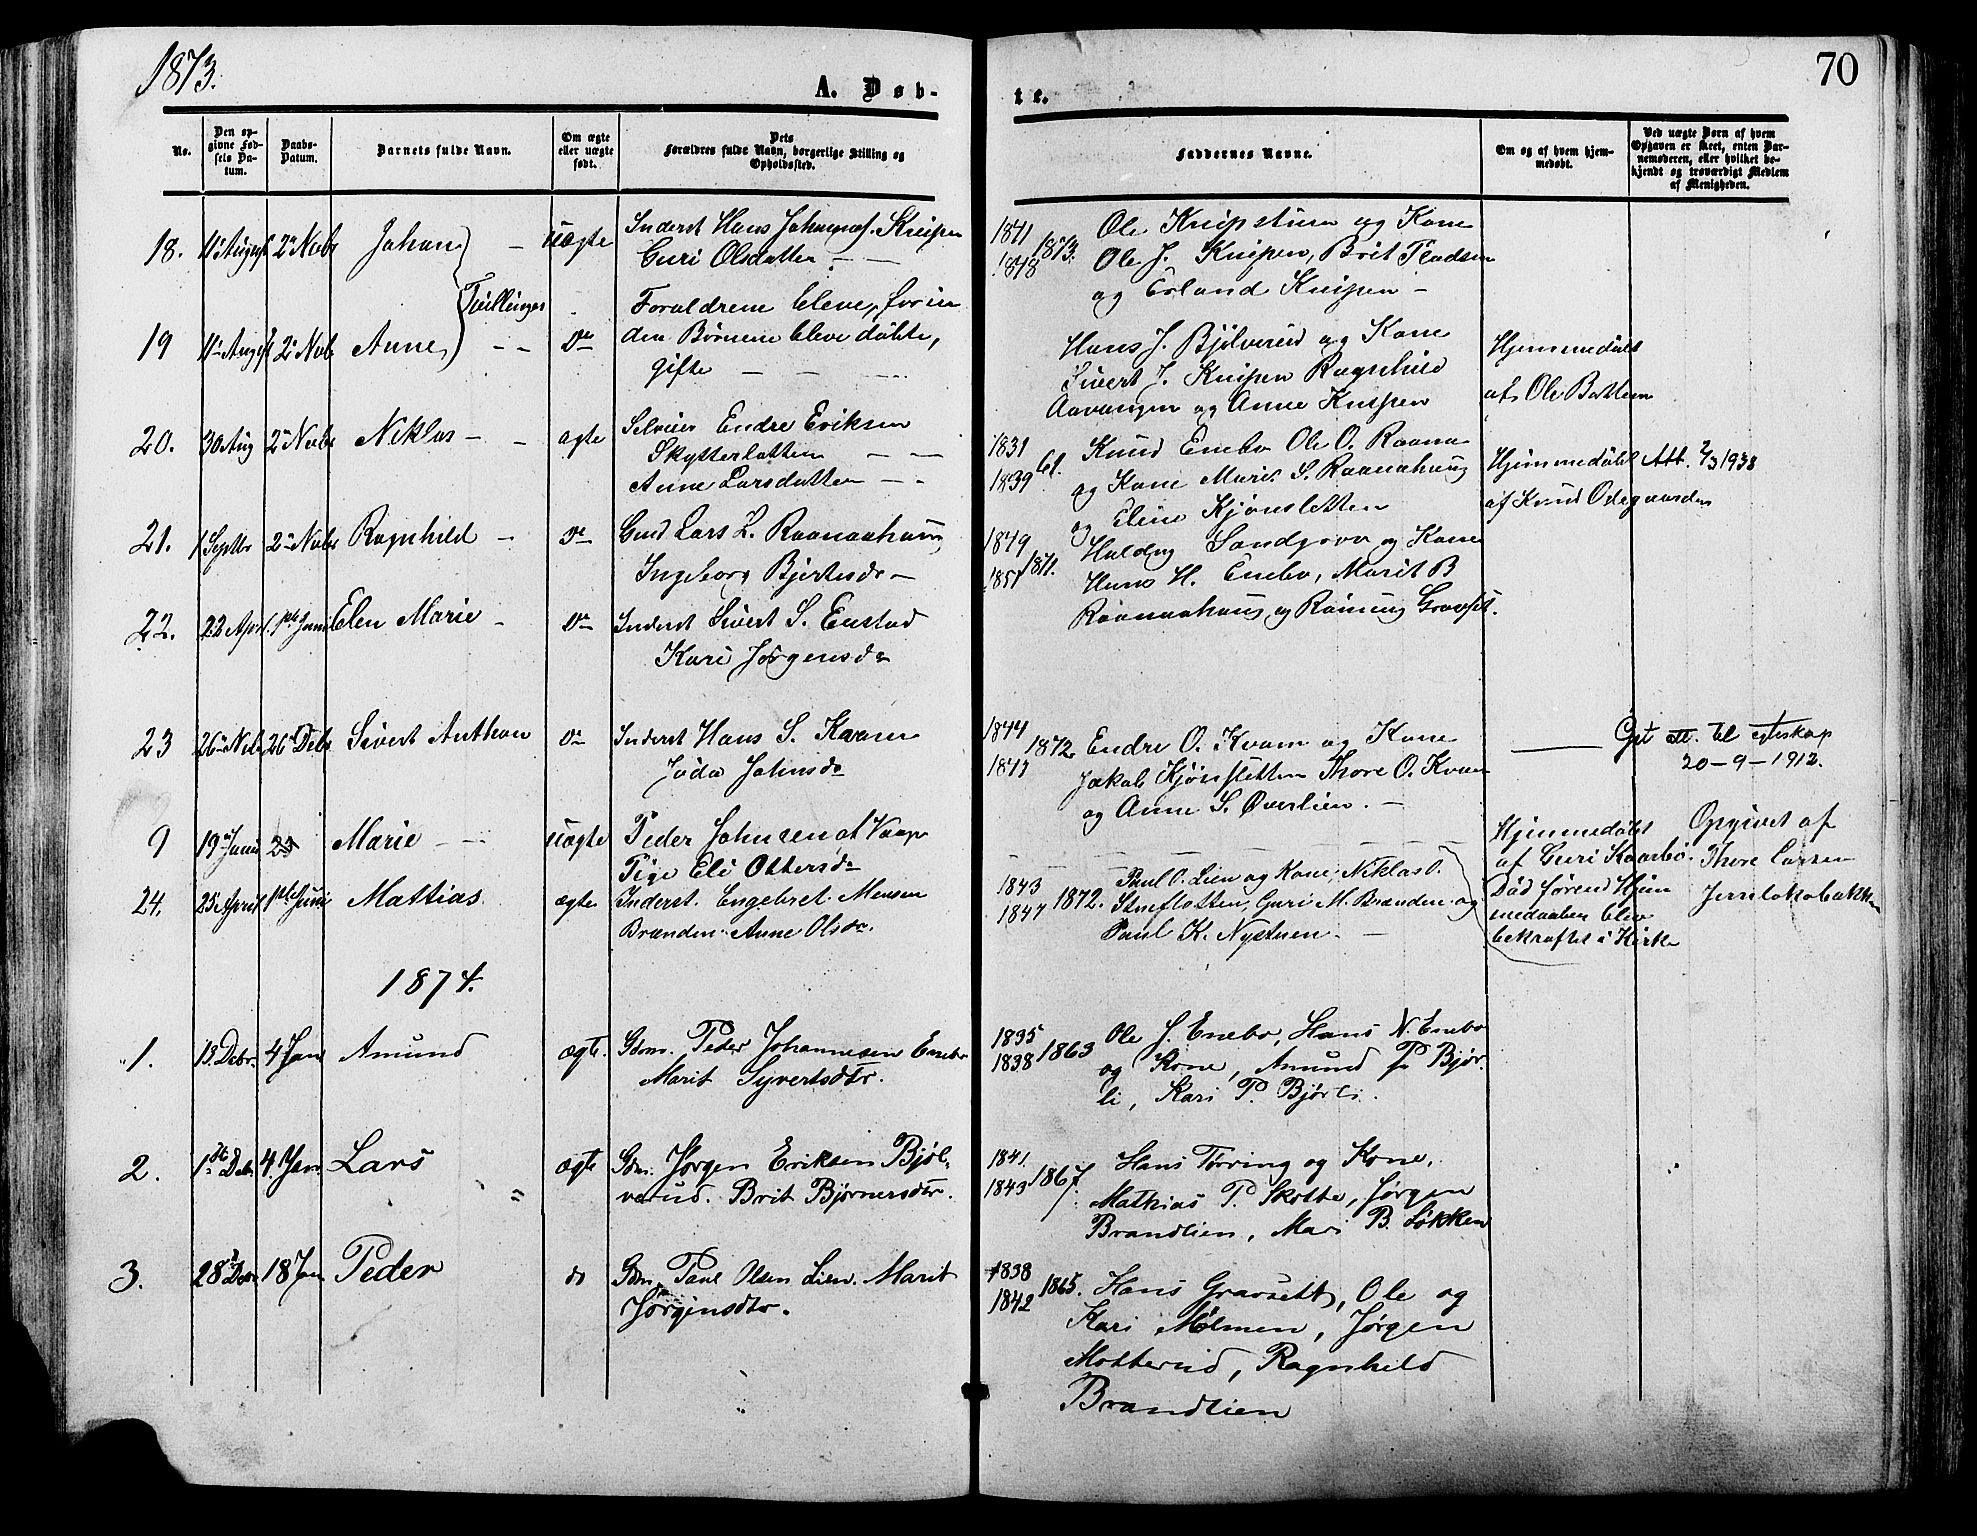 SAH, Lesja prestekontor, Ministerialbok nr. 9, 1854-1889, s. 70